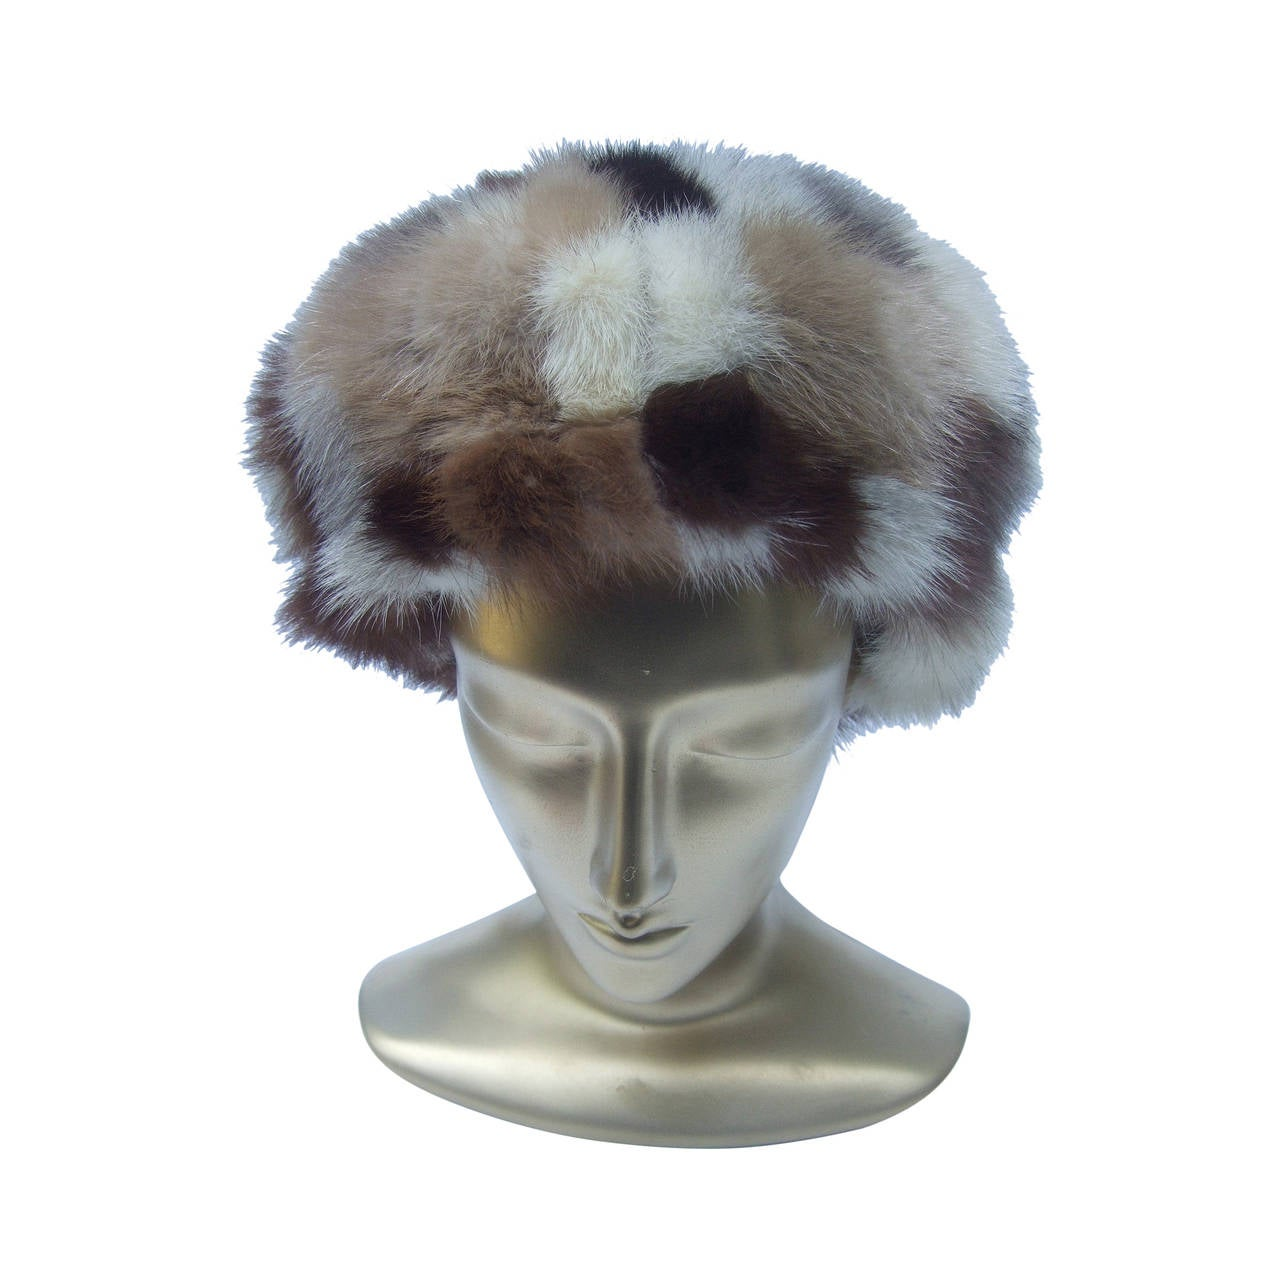 Saks Fifth Avenue Mink Patch Tile Hat c 1970